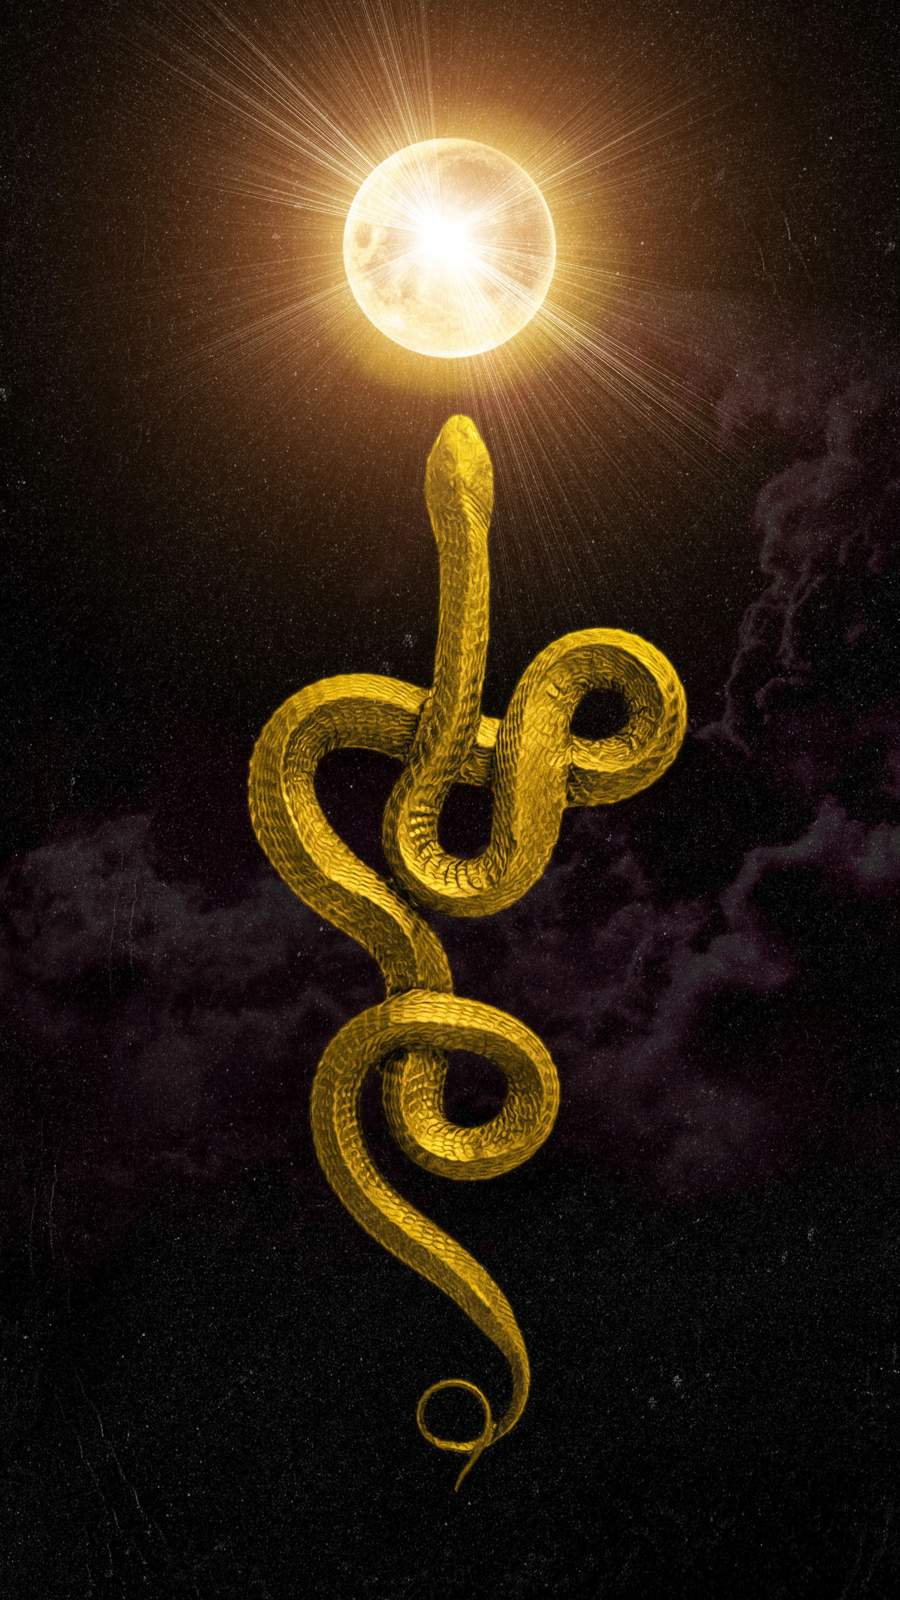 Golden Snake iPhone Wallpaper